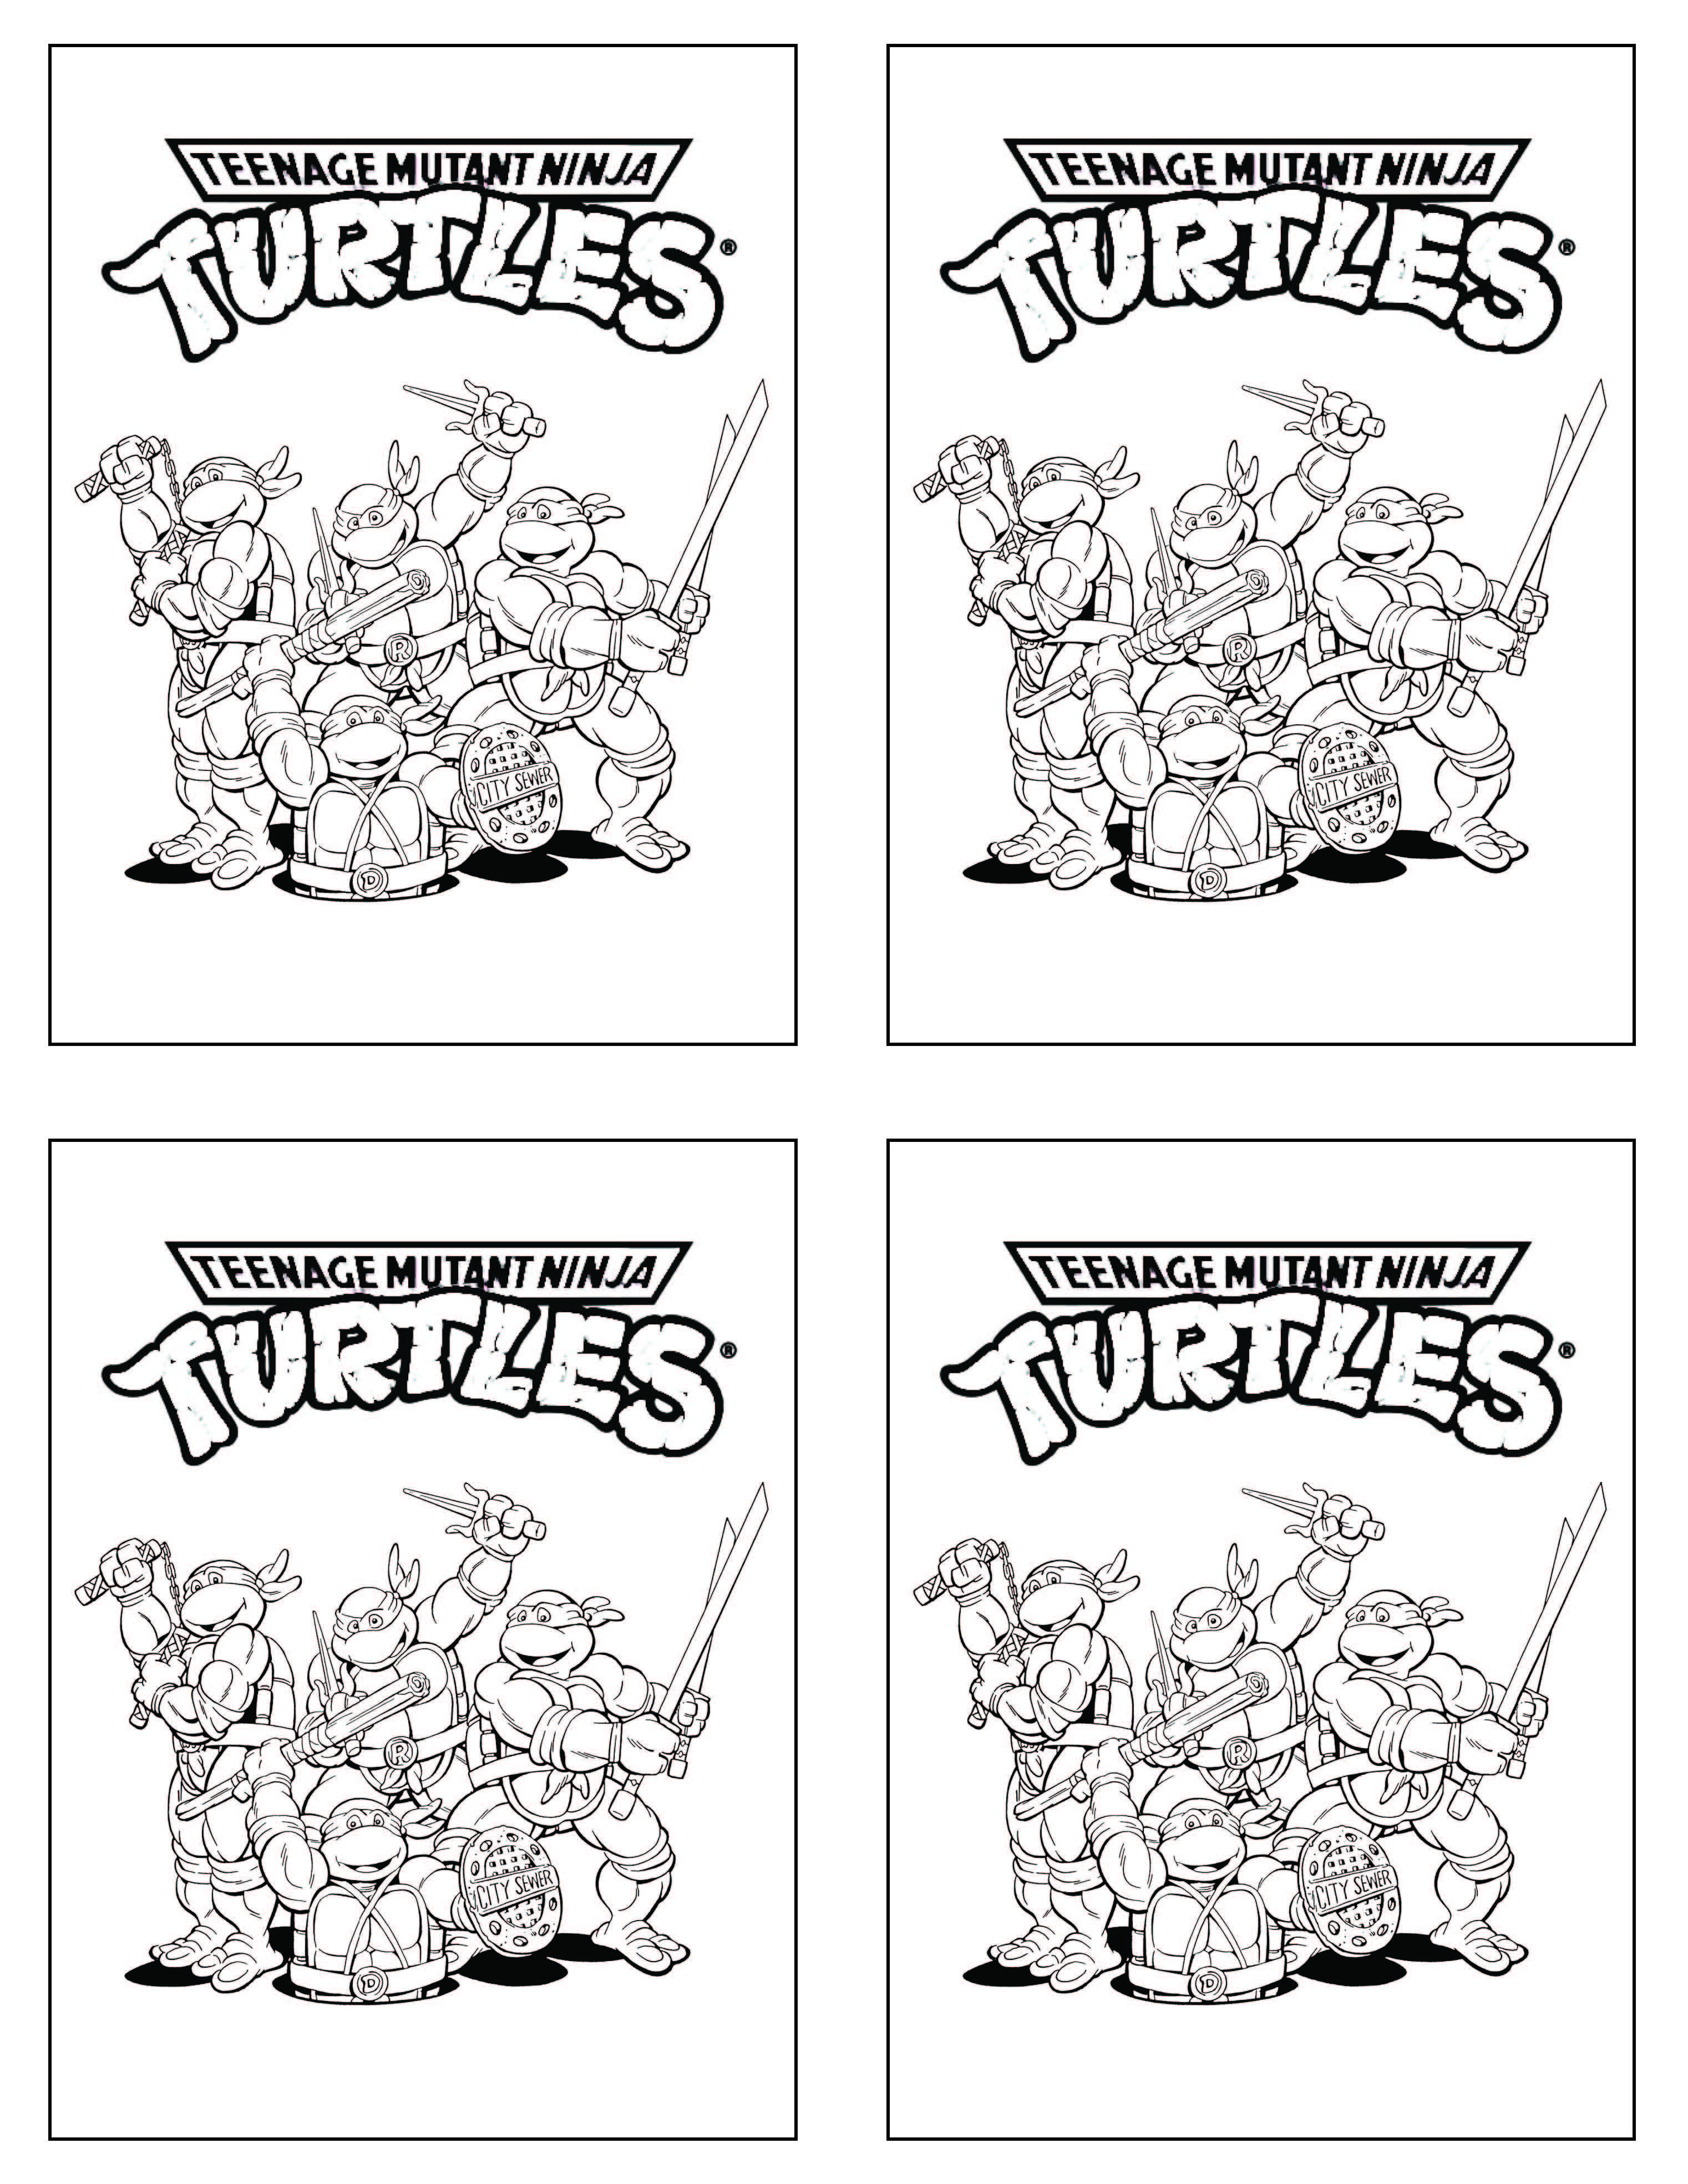 Teenage Mutant Ninja Turtles Tmnt Coloring Page From Free Printable